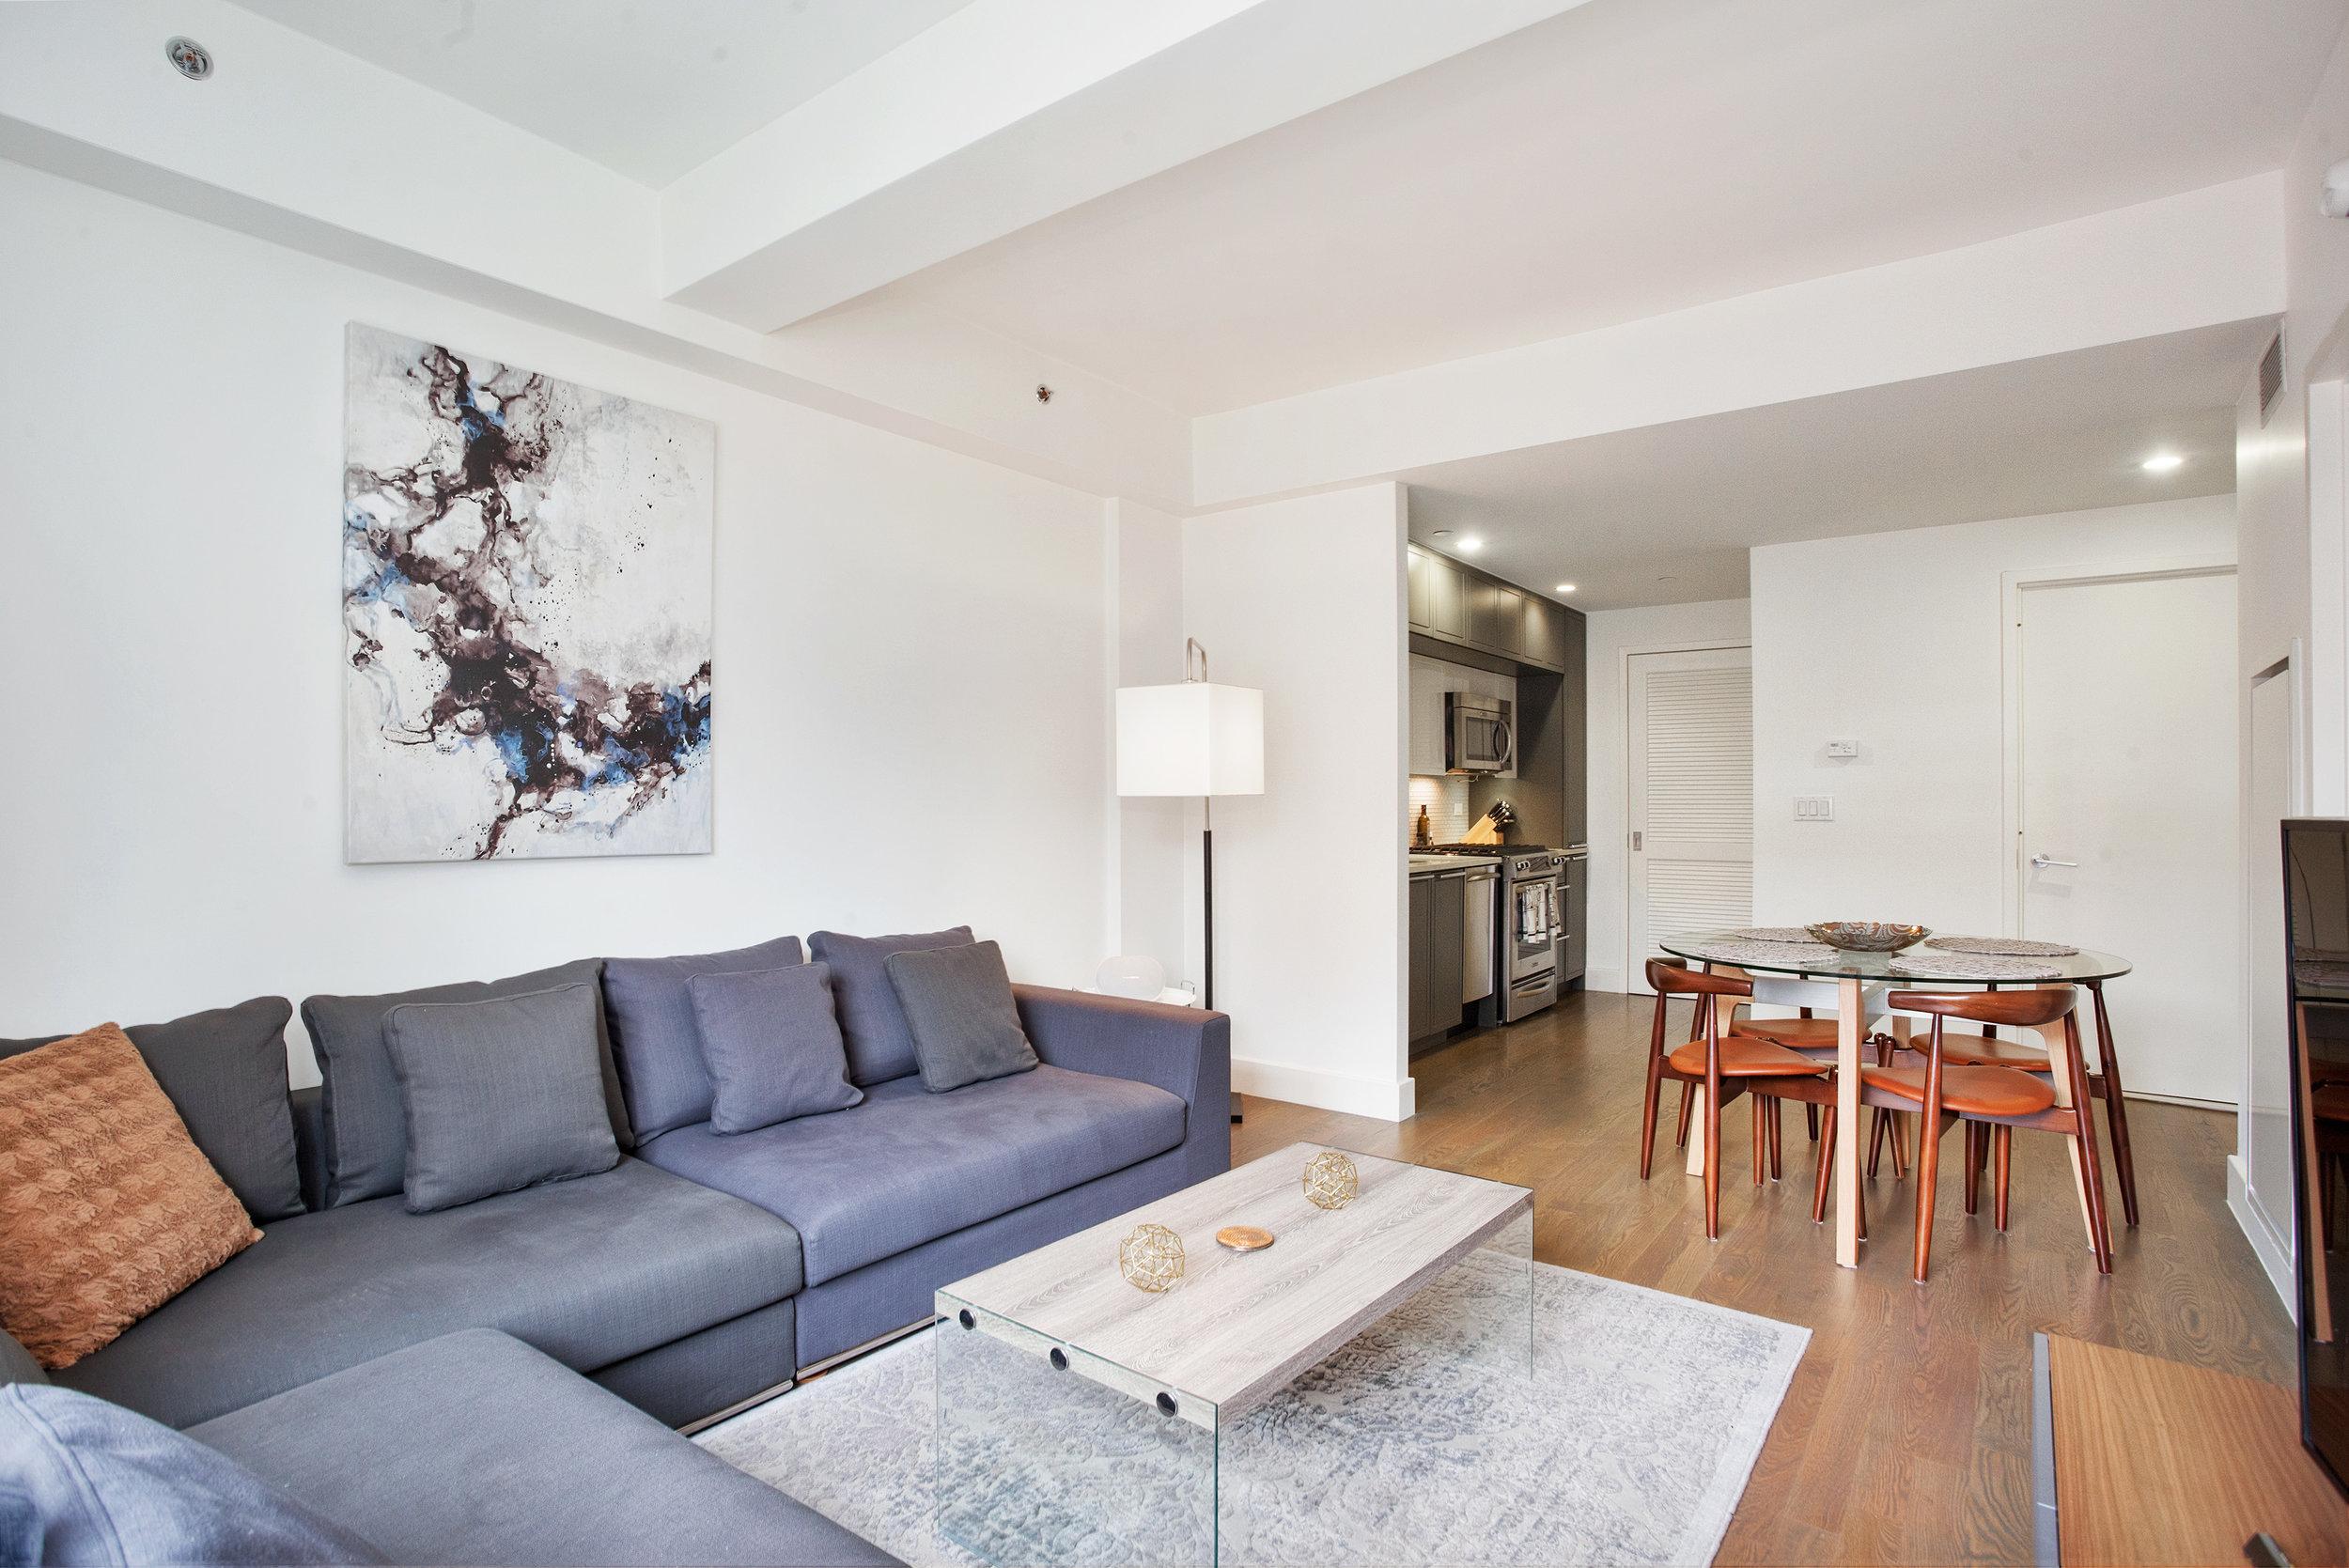 432 West 52nd Street, Unit 4F - $970,000